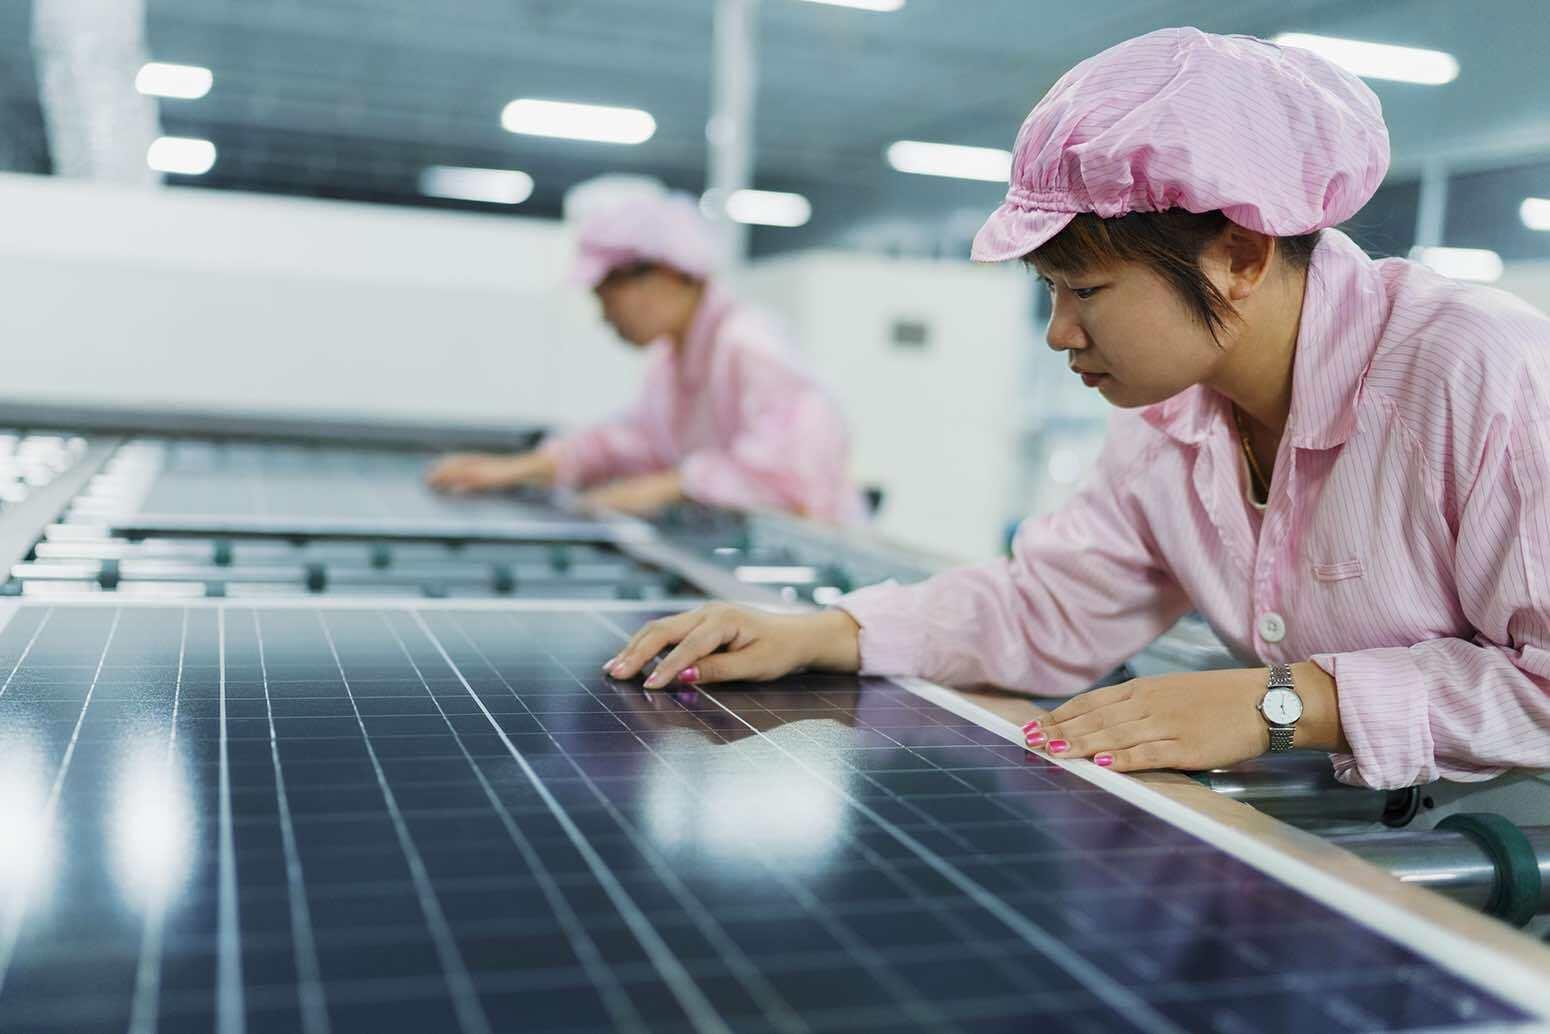 Renewables jobs reach 11.5 million globally